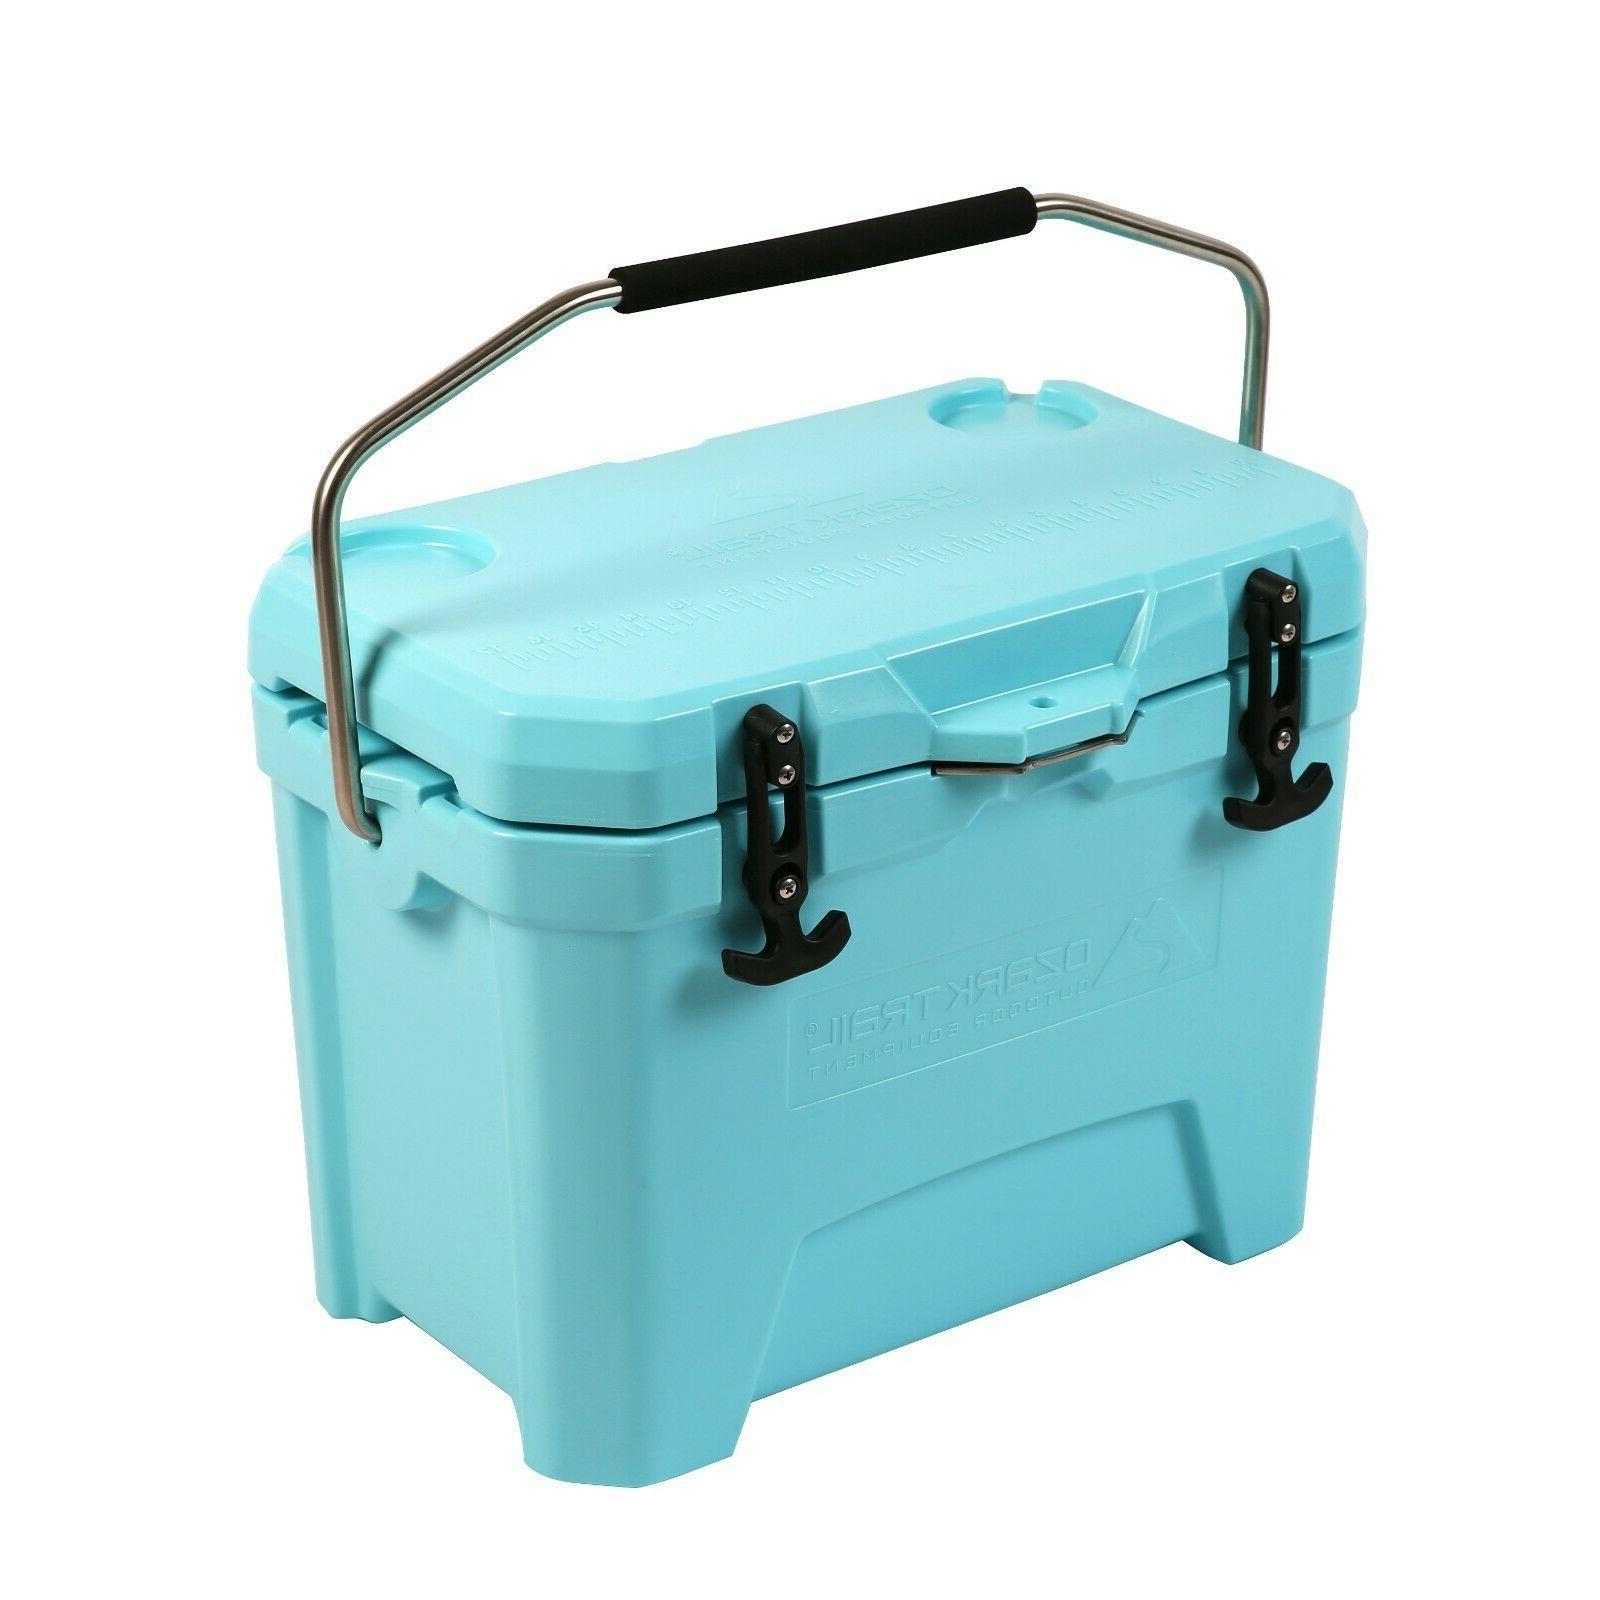 26 quart high performance cooler marine blue